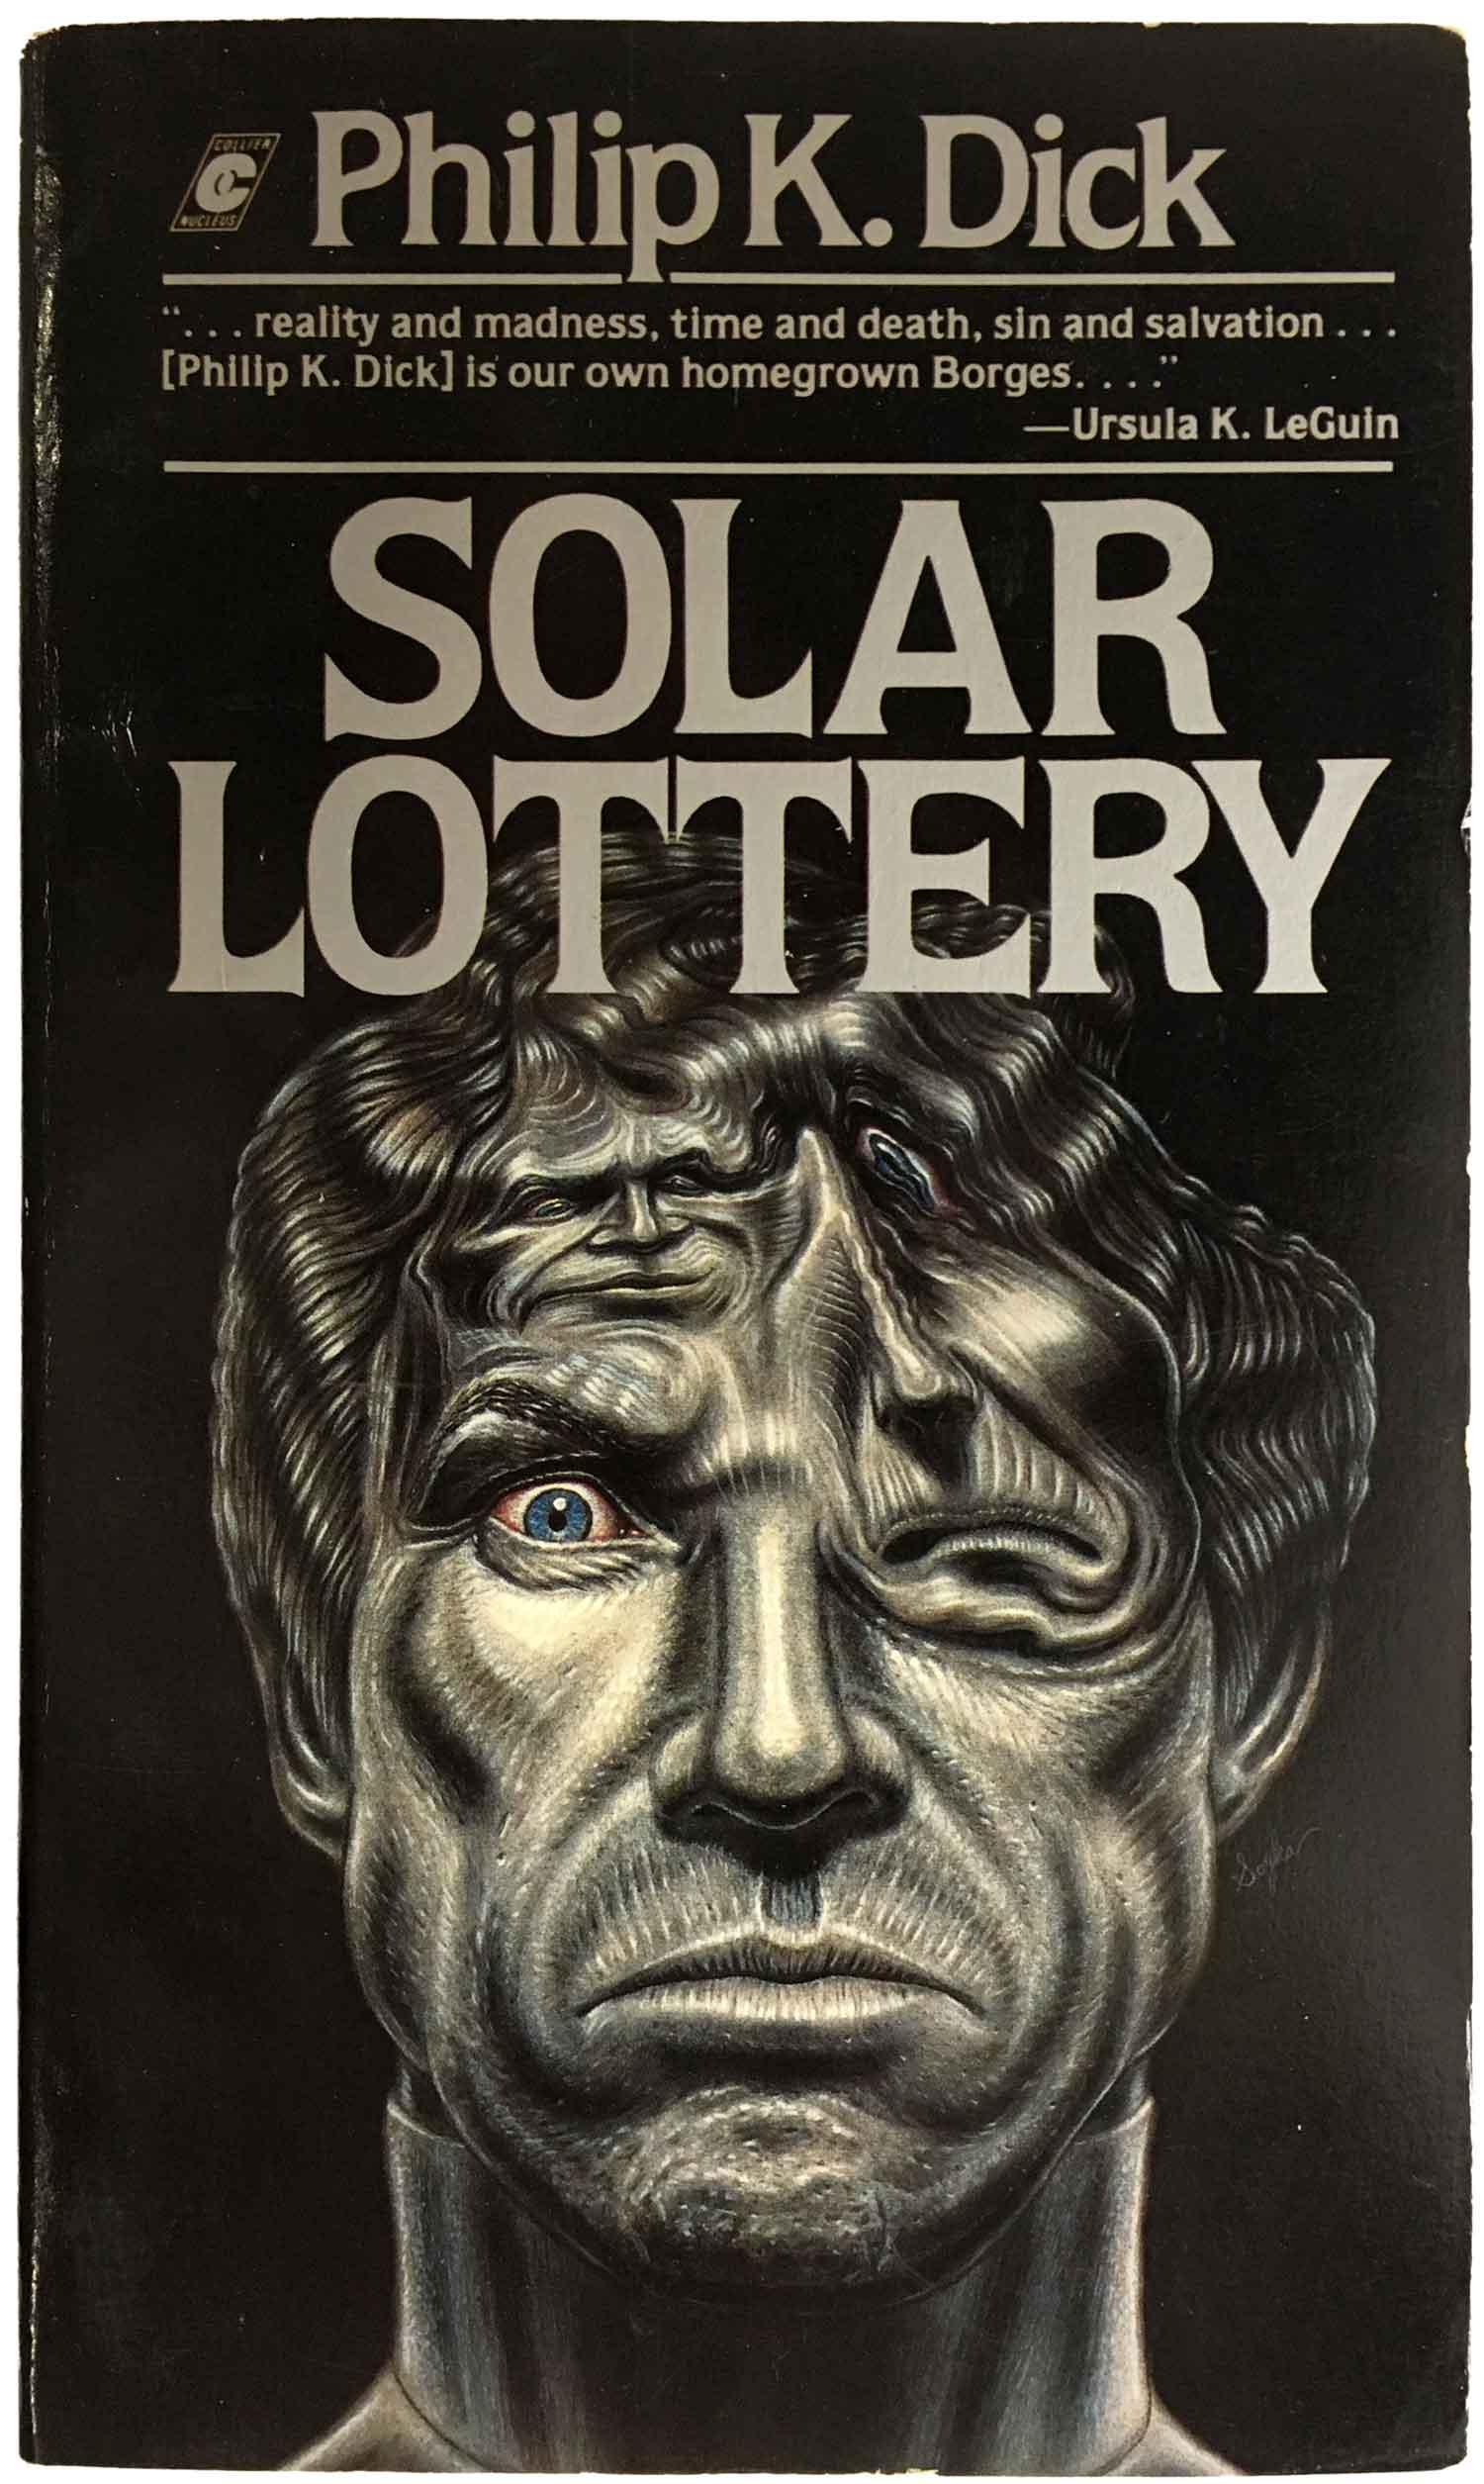 pkd_solarlottery_collier